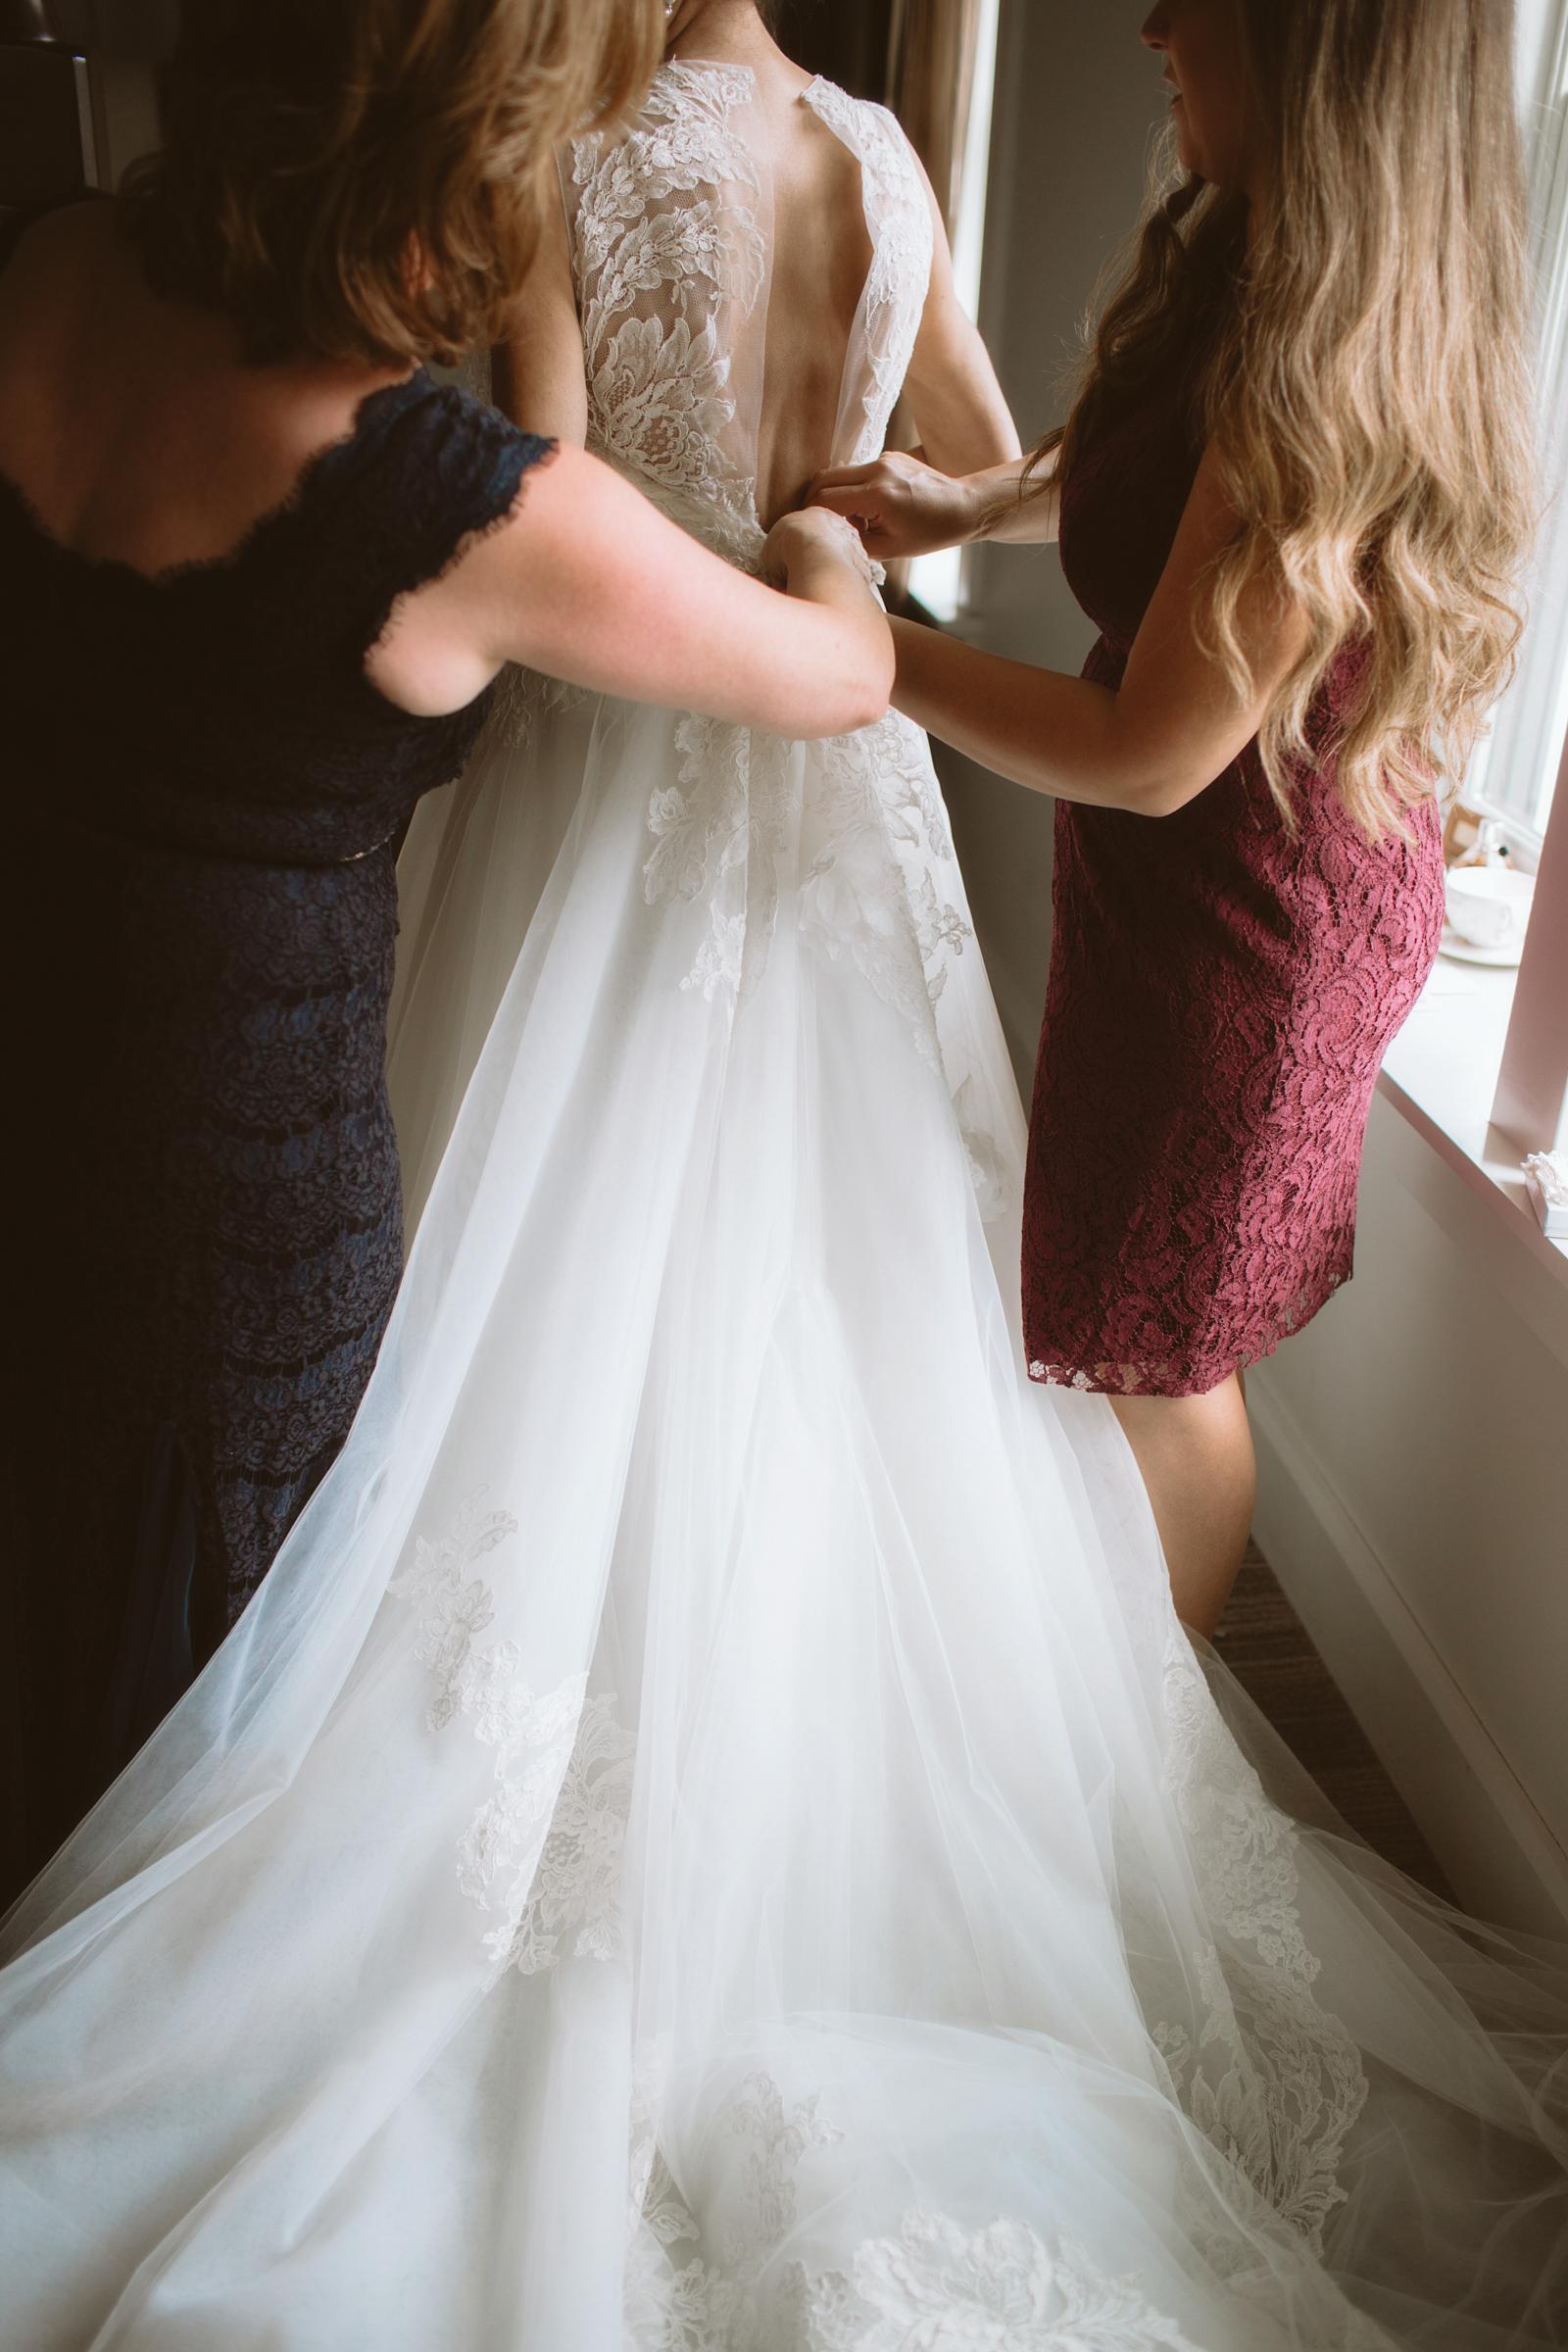 wedding day | MFA St Pete | Vanessa Boy Photography | vanessaboy.com-76.com |final.jpg